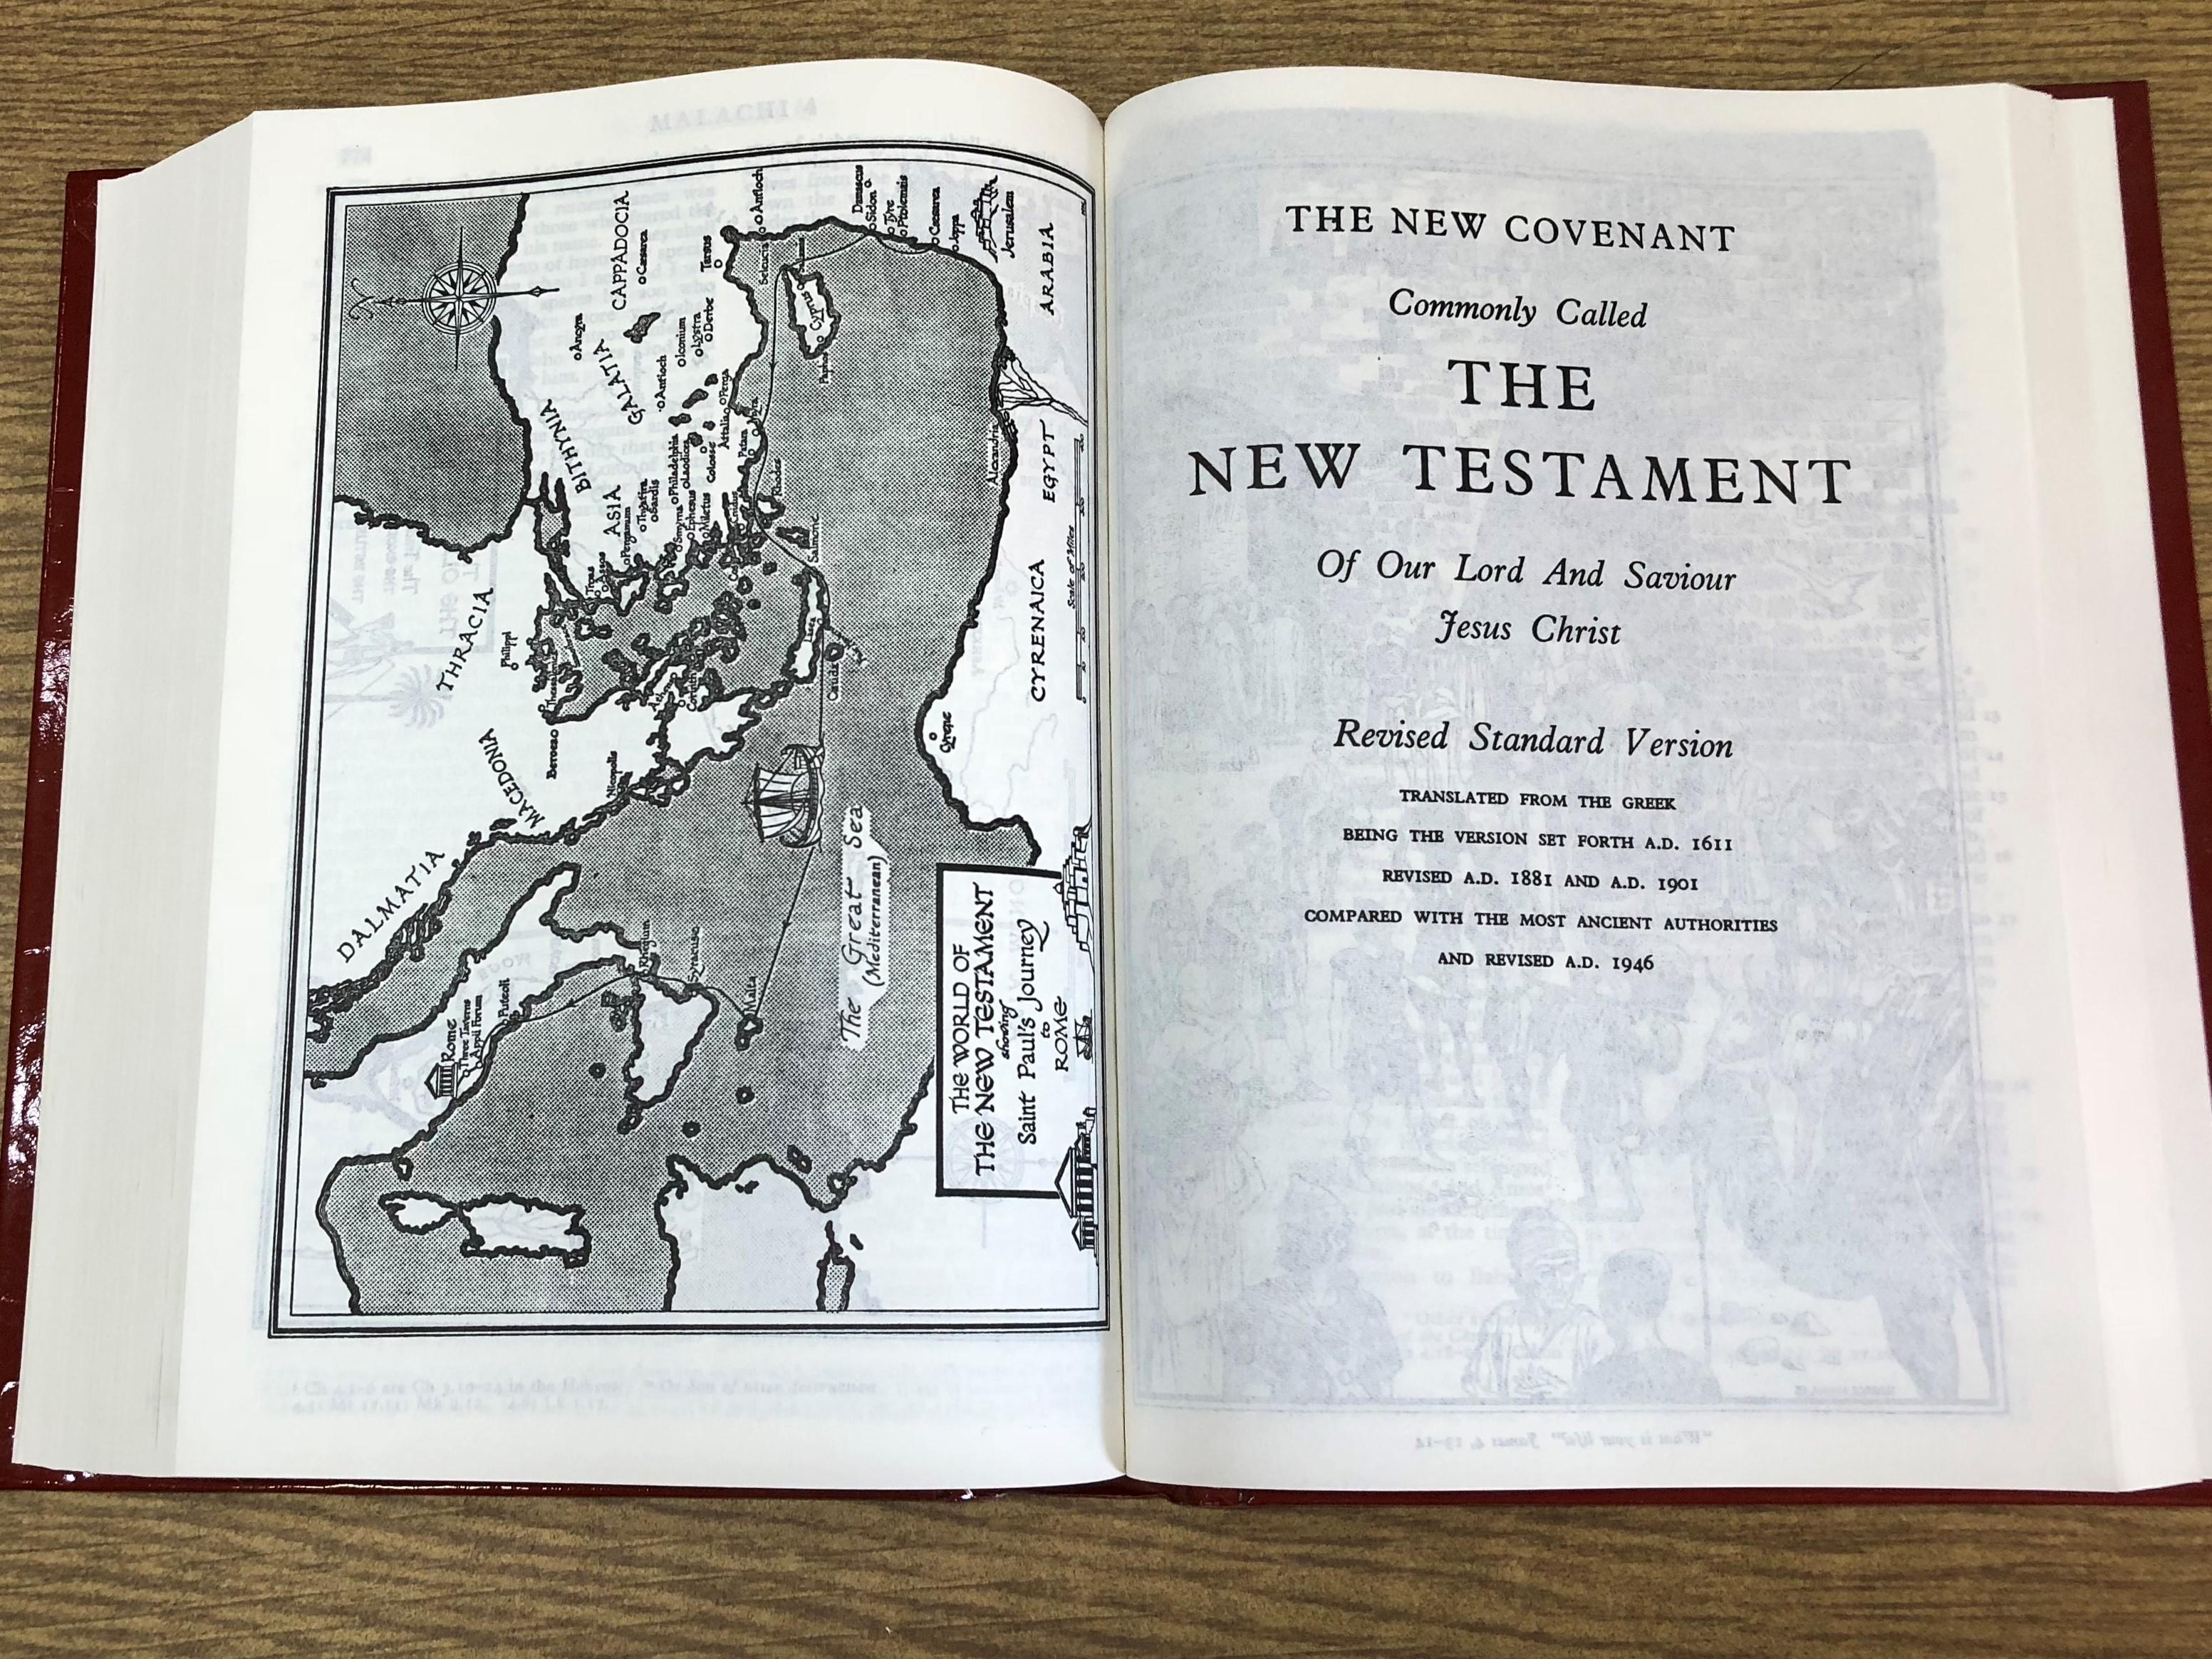 english-bible-revised-standard-version-rsv-burg-11-.jpg